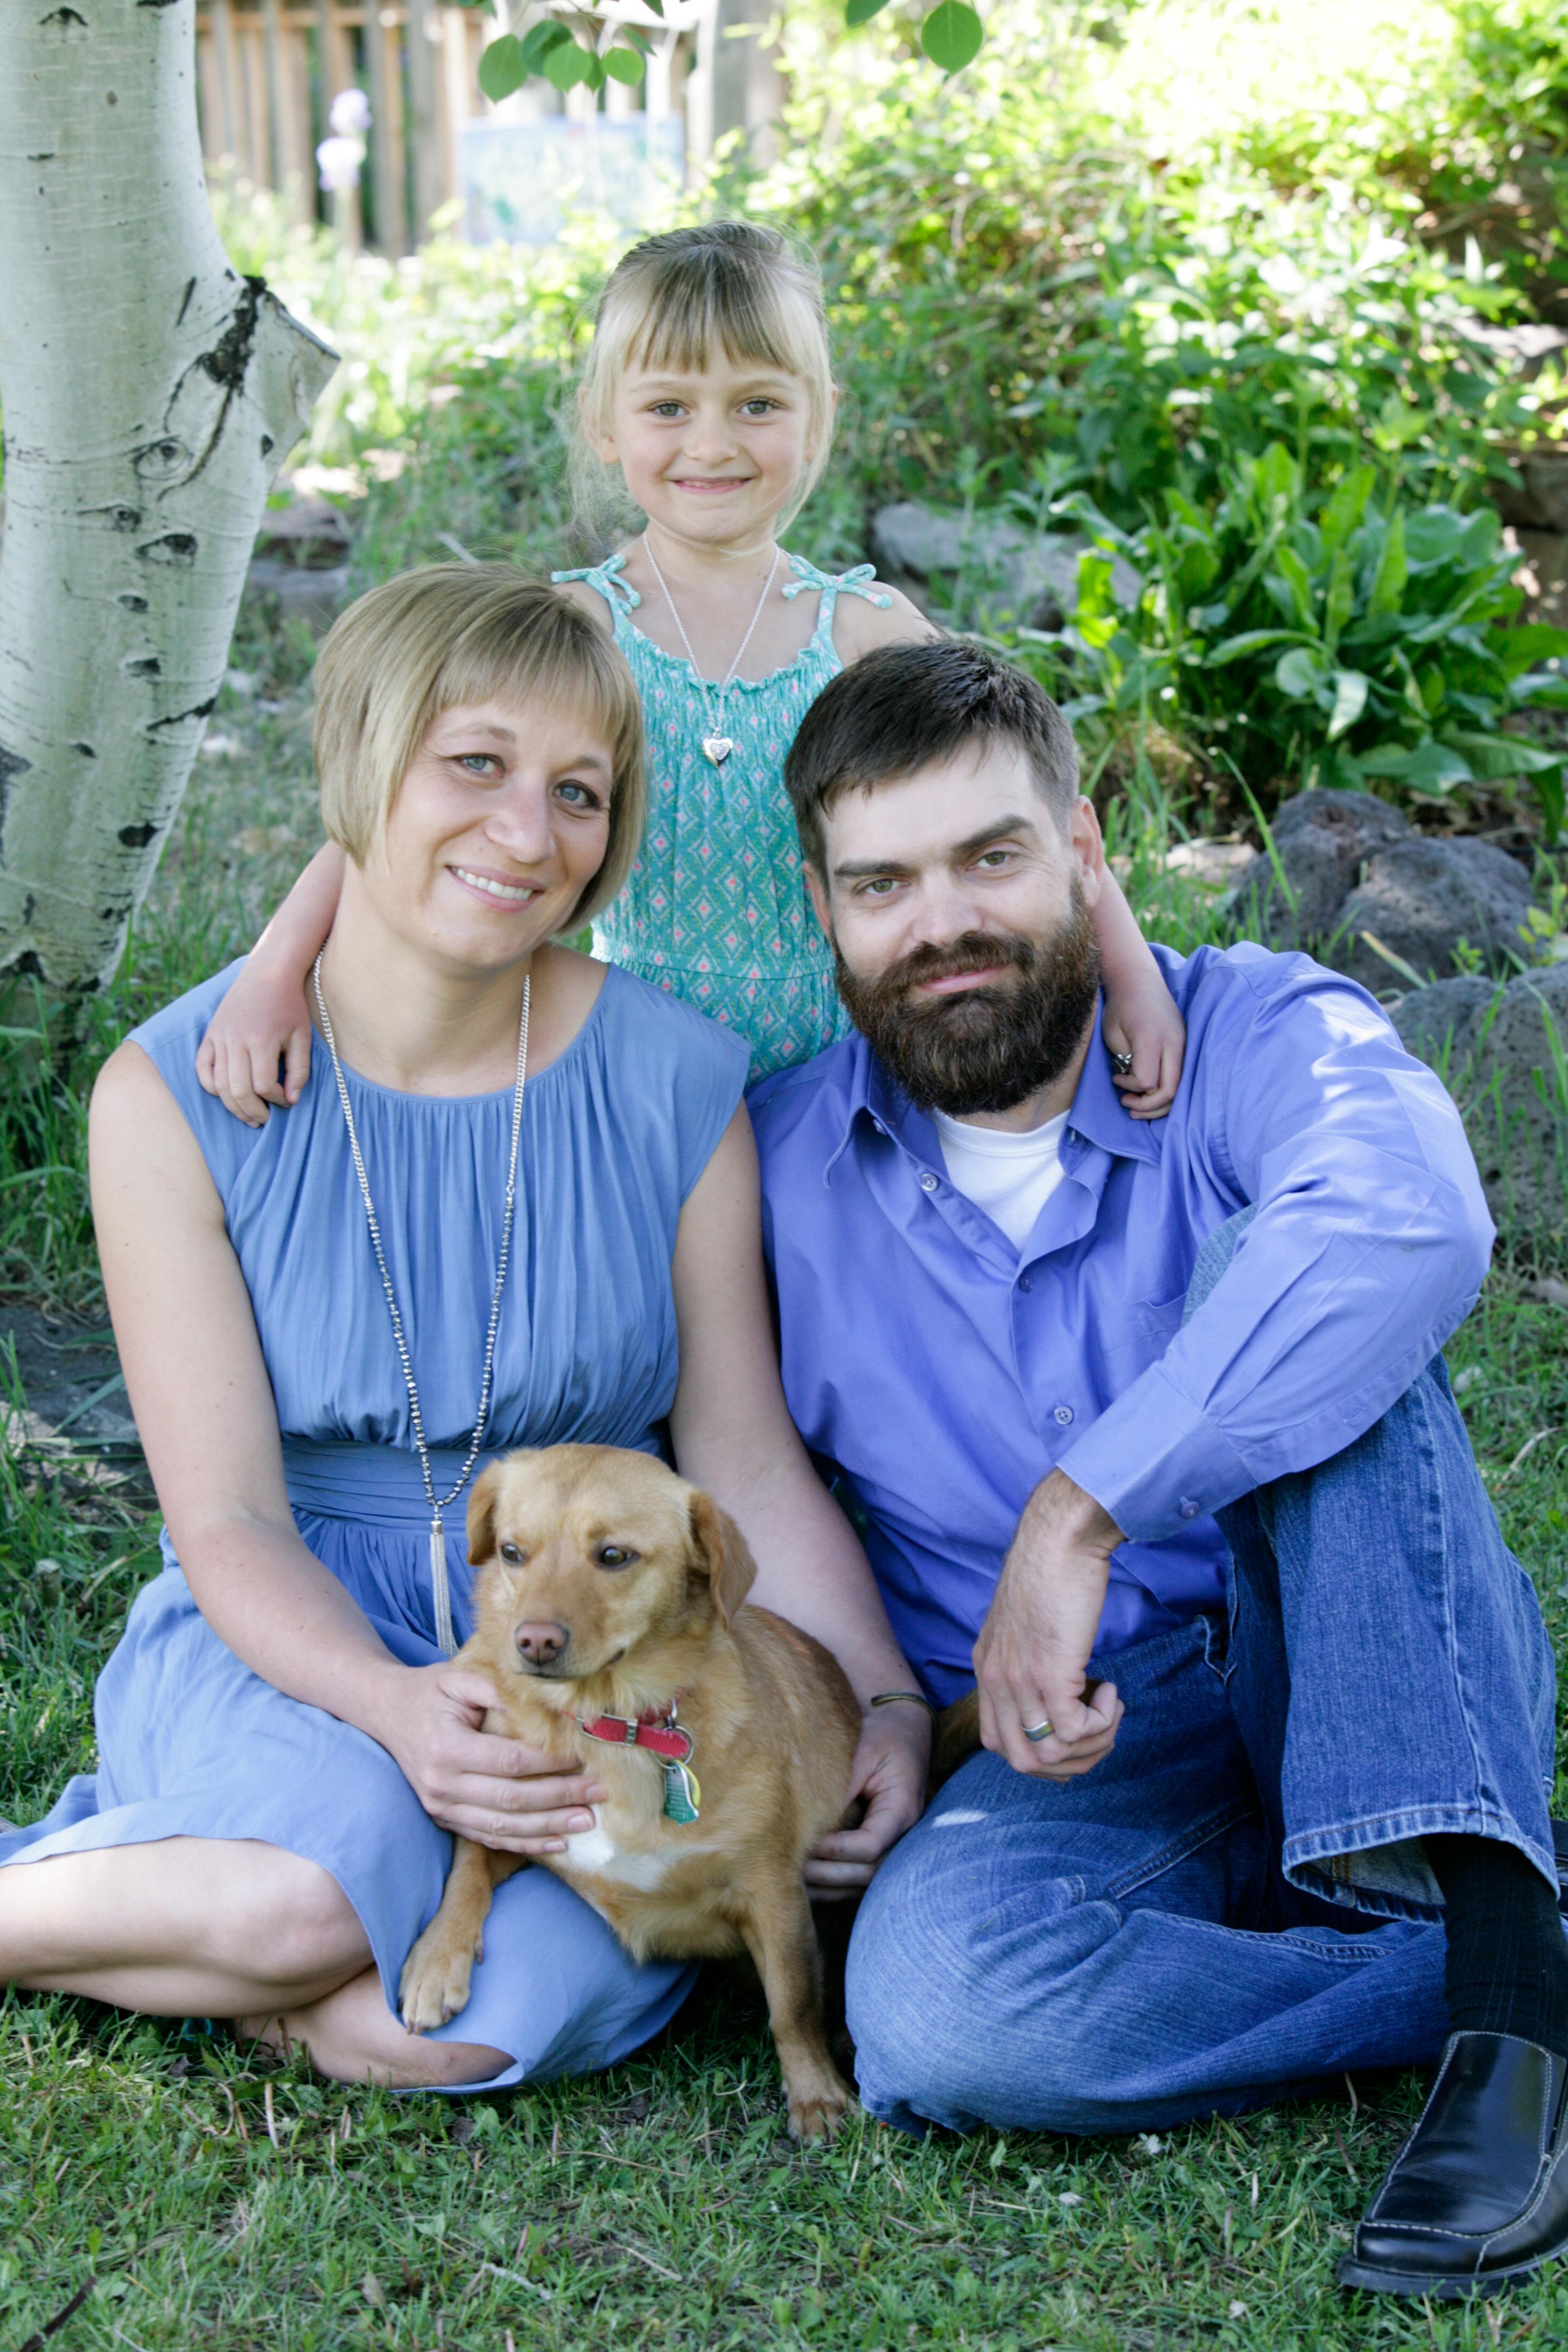 Family Portraits in Springtime